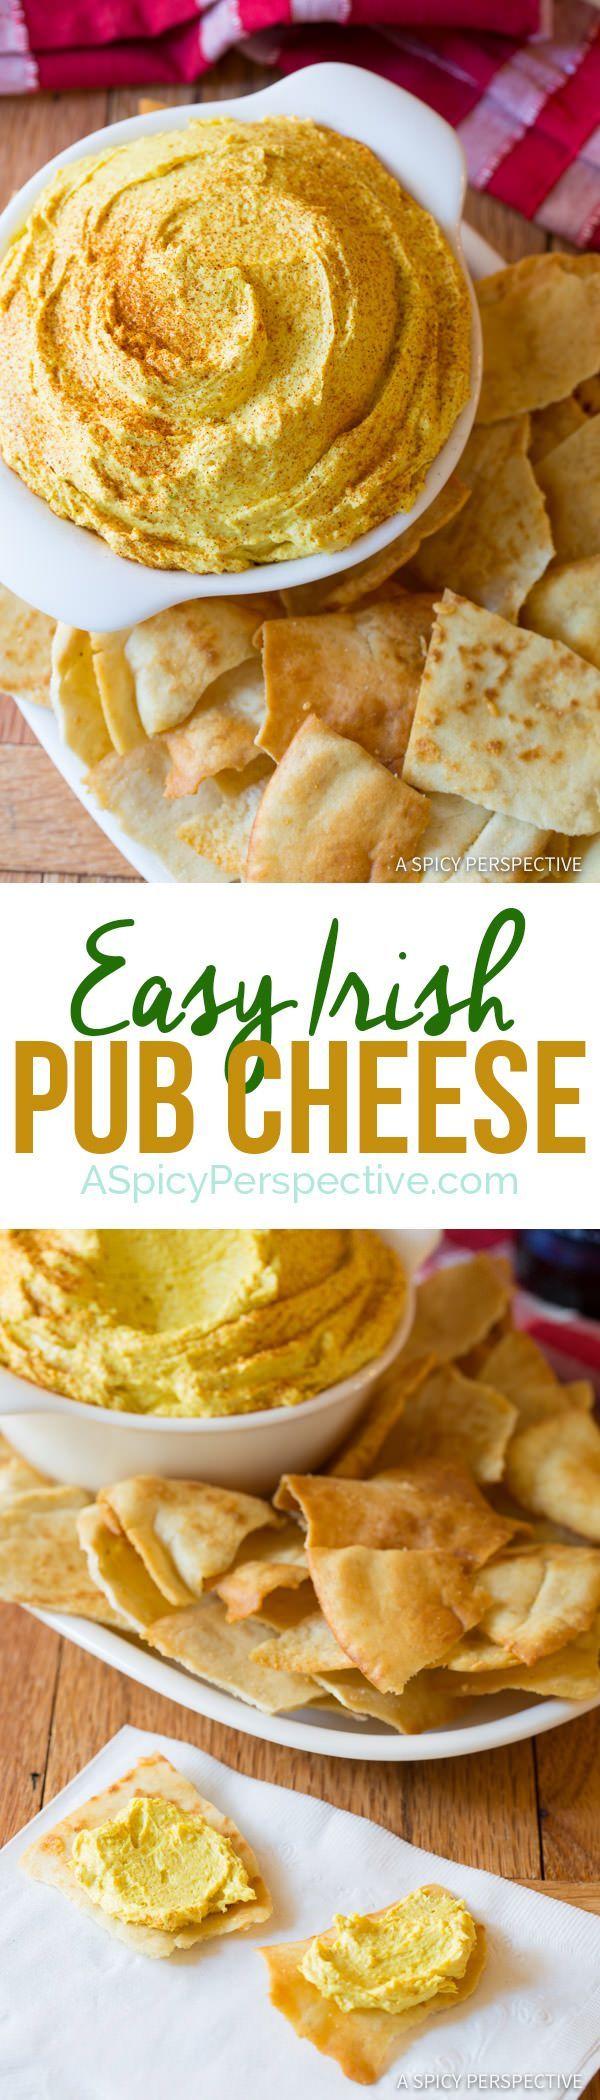 6-Ingredient Irish Pub Cheese | http://ASpicyPerspective.com